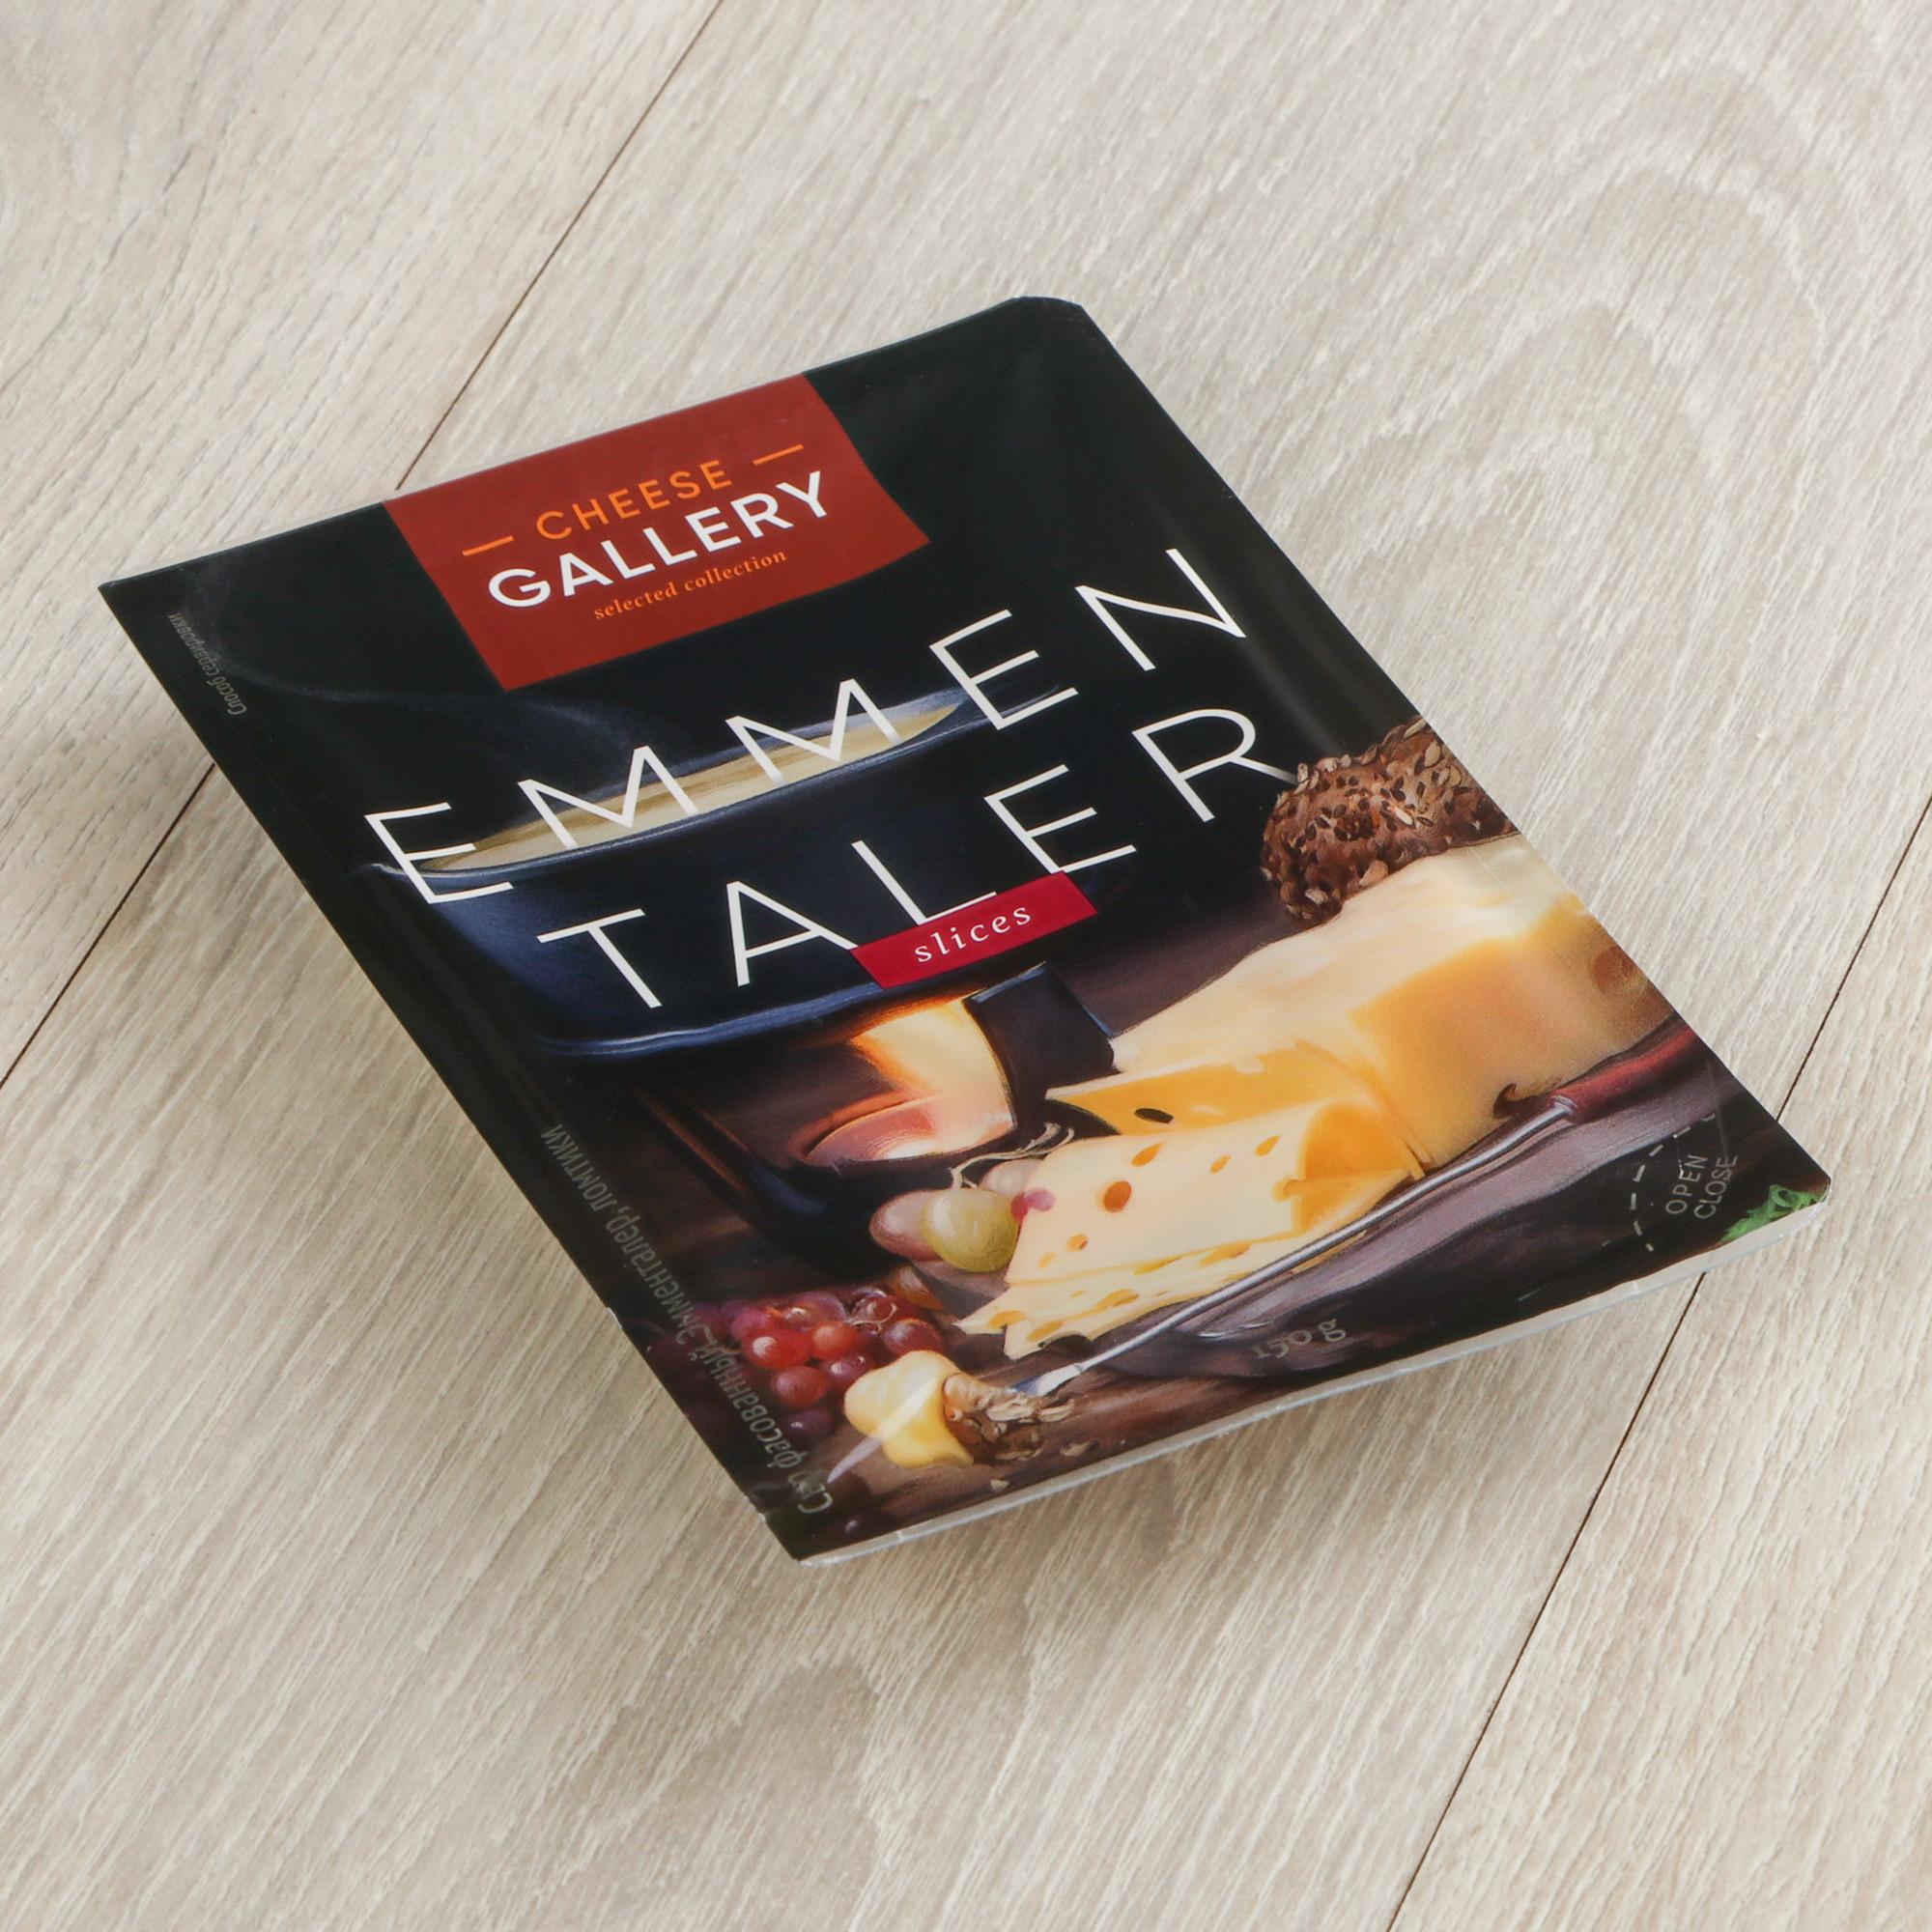 Сыр Cheese Gallery Эмменталер 45% 150 г cheese gallery sante blue крем сыр 150 г